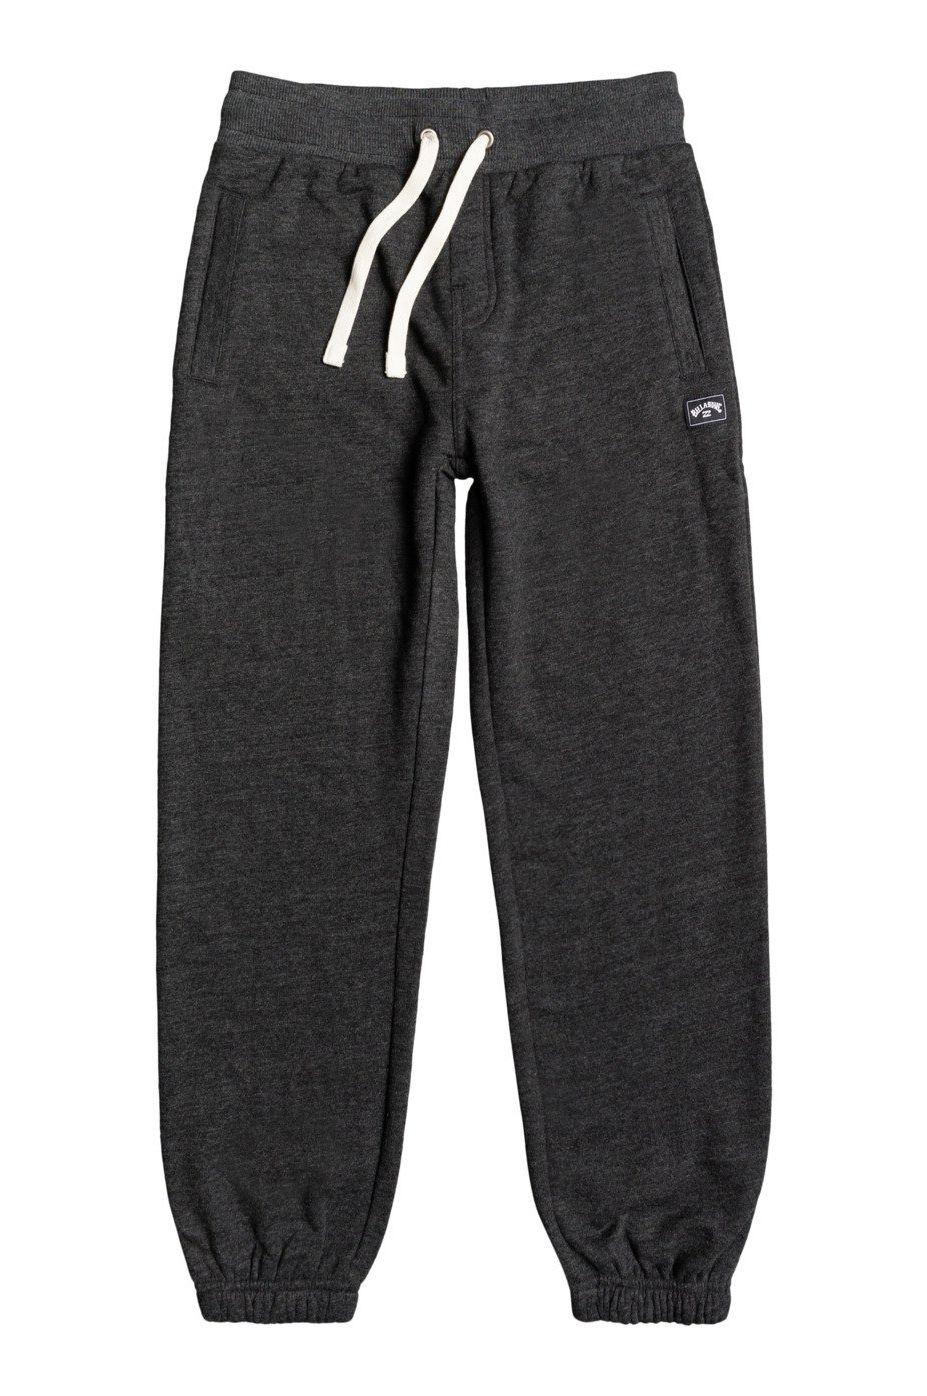 Billabong Pants ALL DAY PANT BOY Black